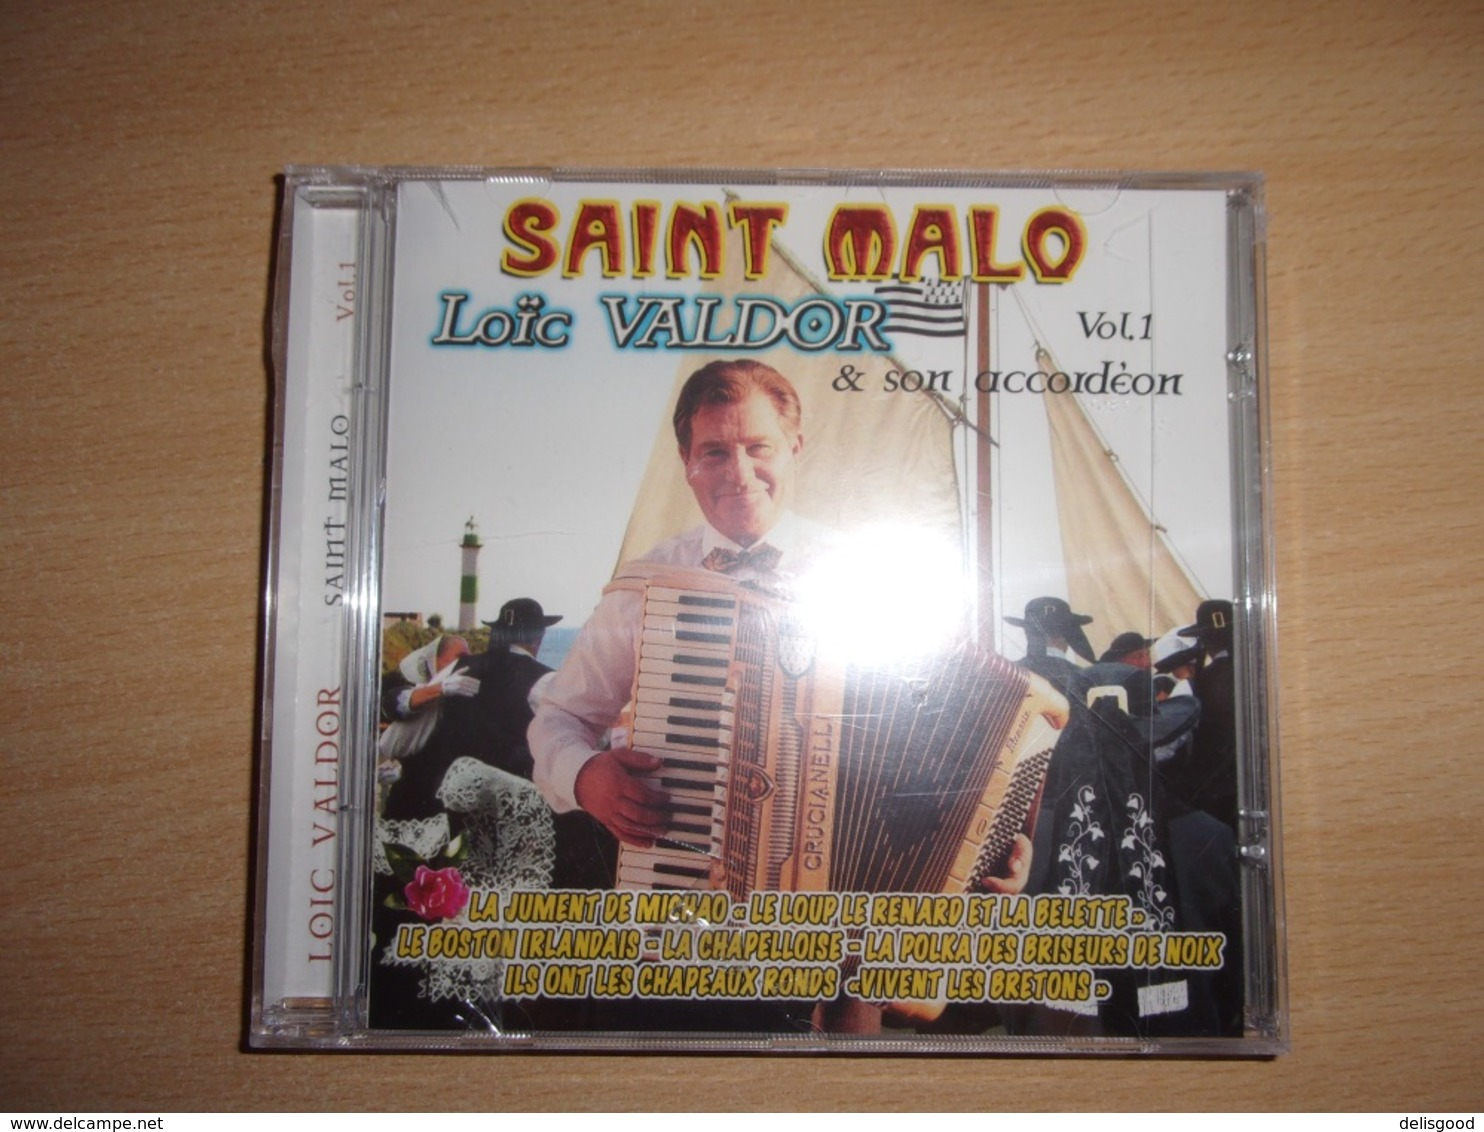 Loic Valdor Et Son Accordeon  : Saint Malo Vol. 1 Rare CD Mint! - Country & Folk